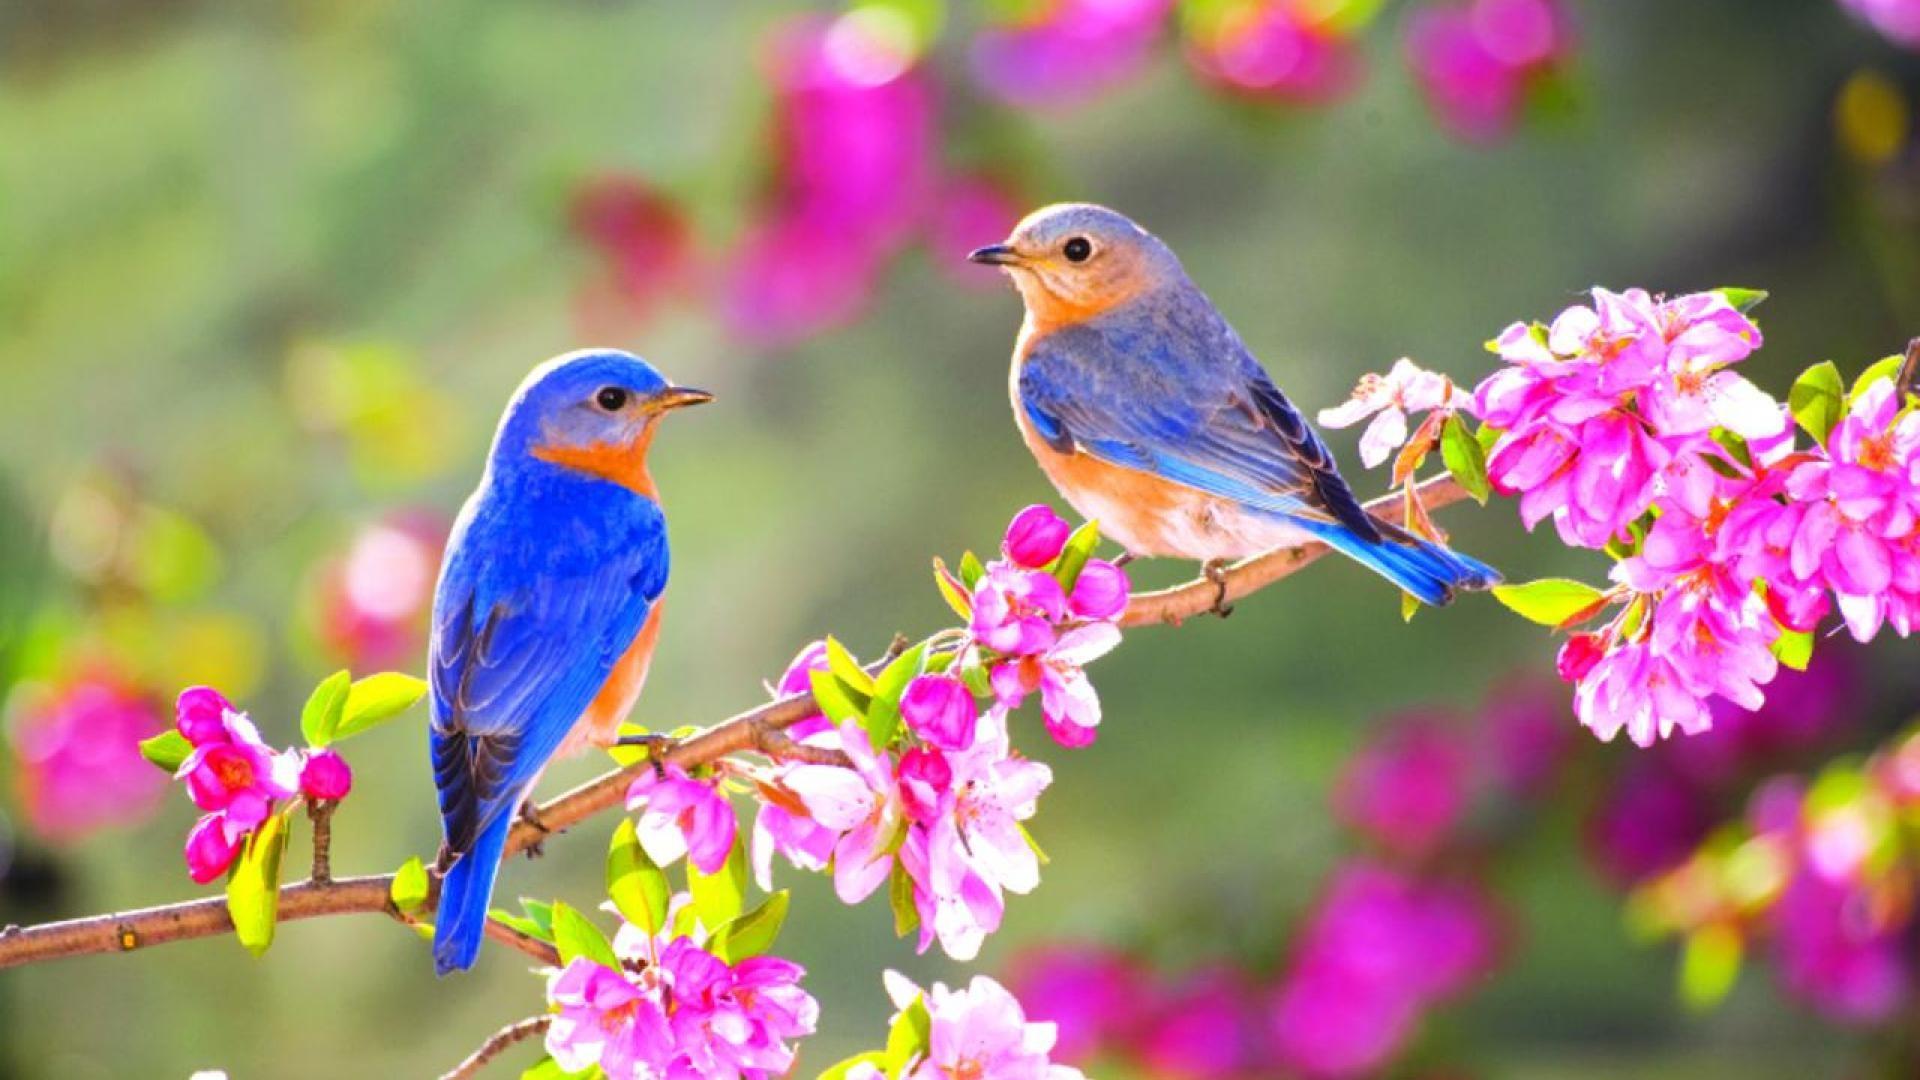 Обои На Телефон Птицы